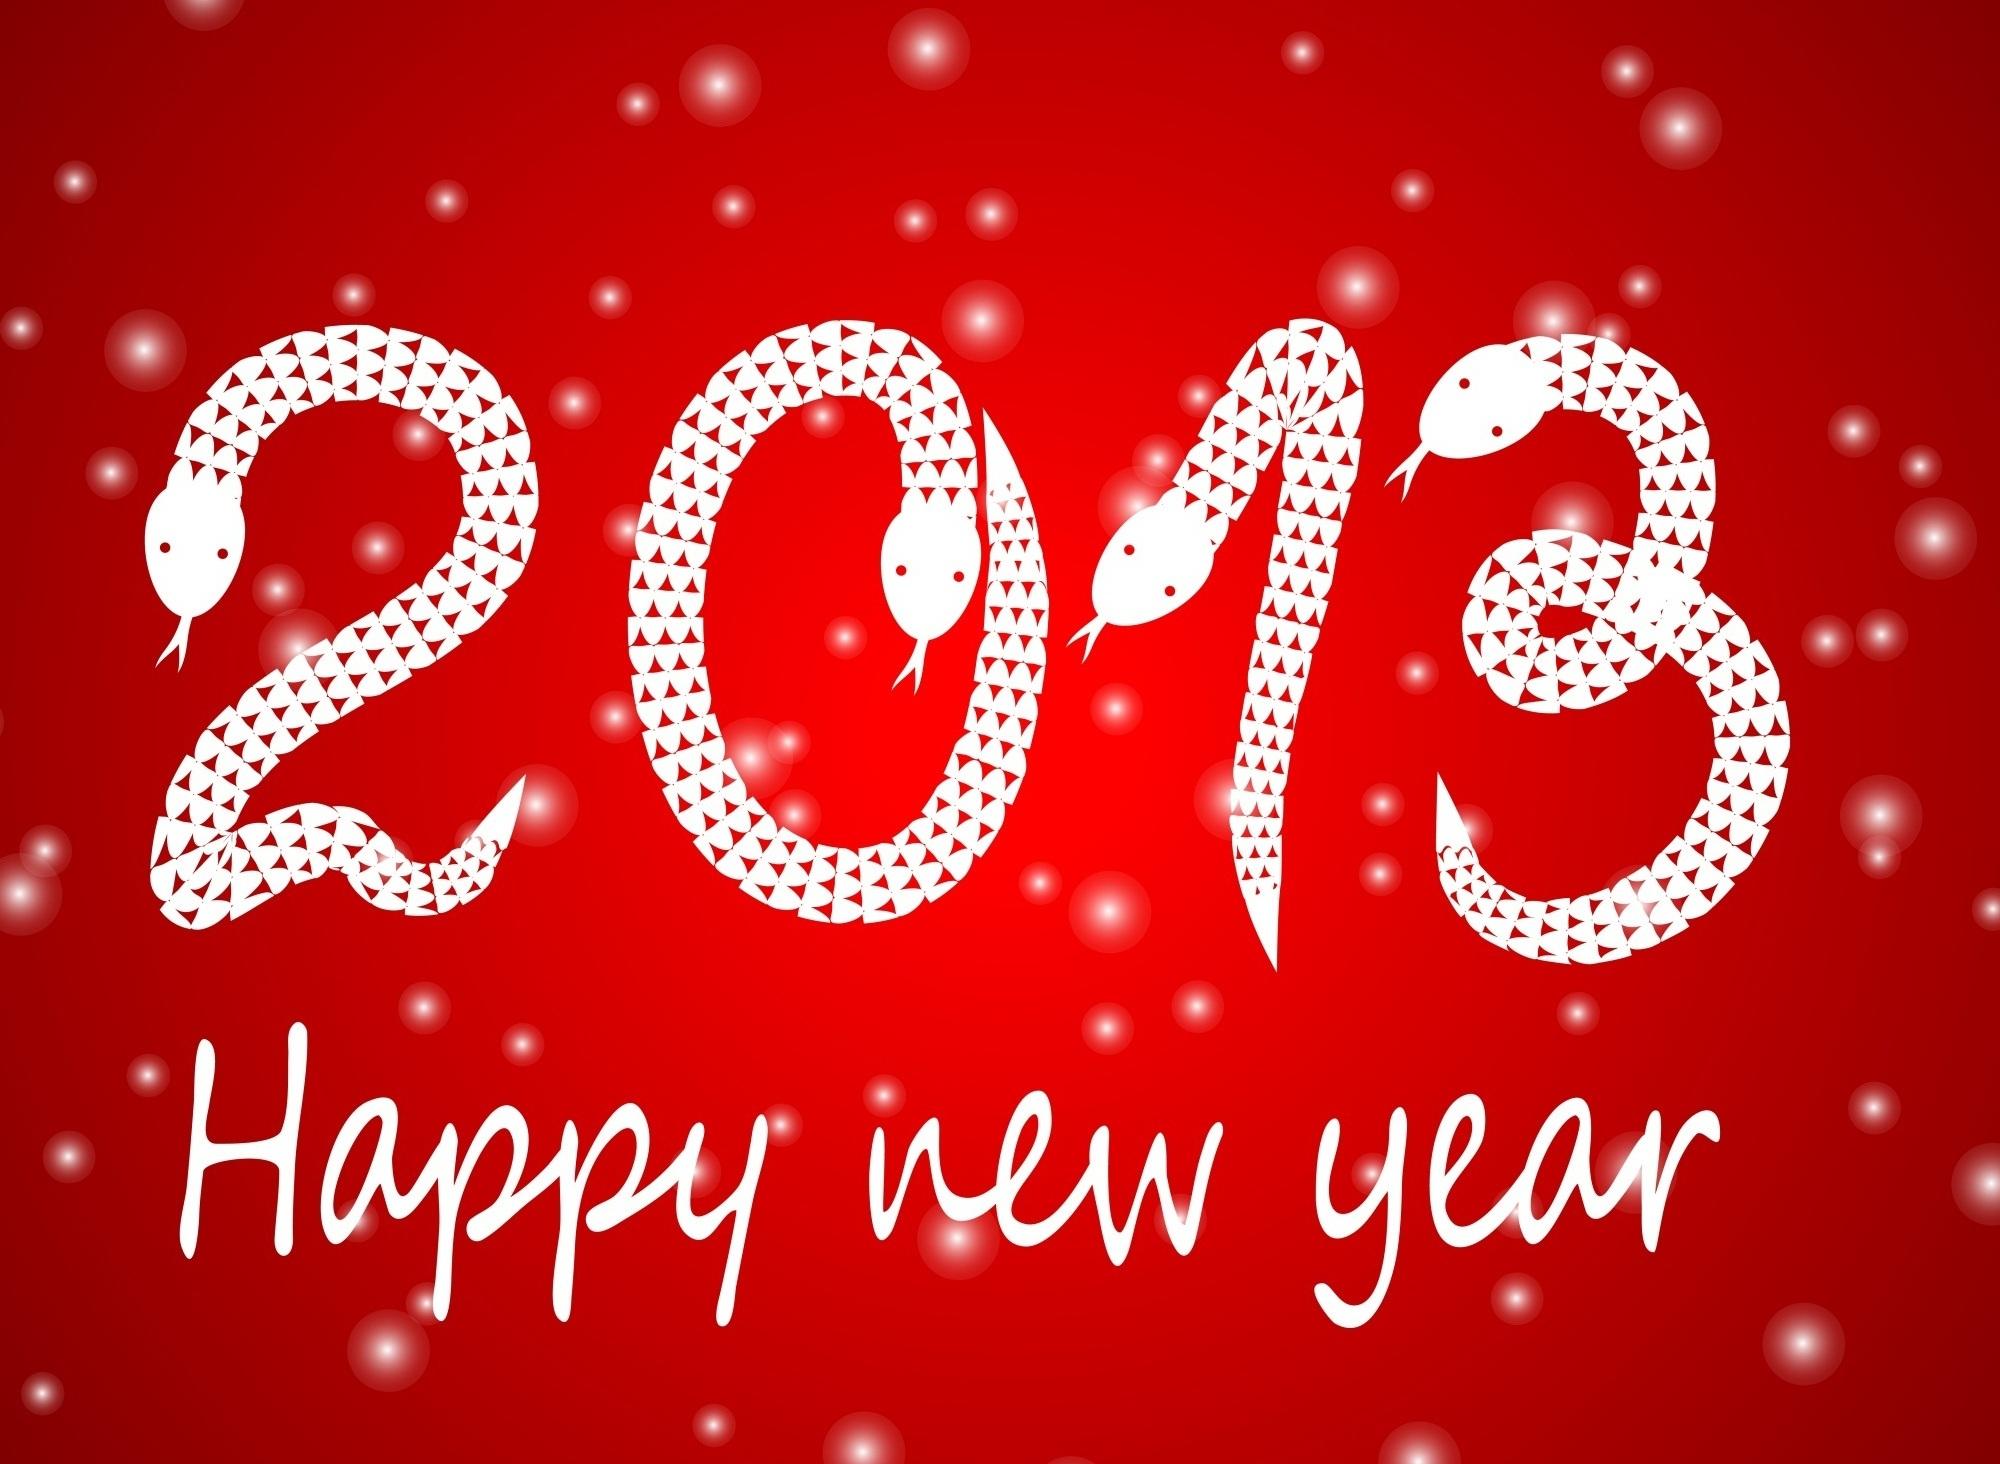 2013-Happy-New-Yearr.jpg